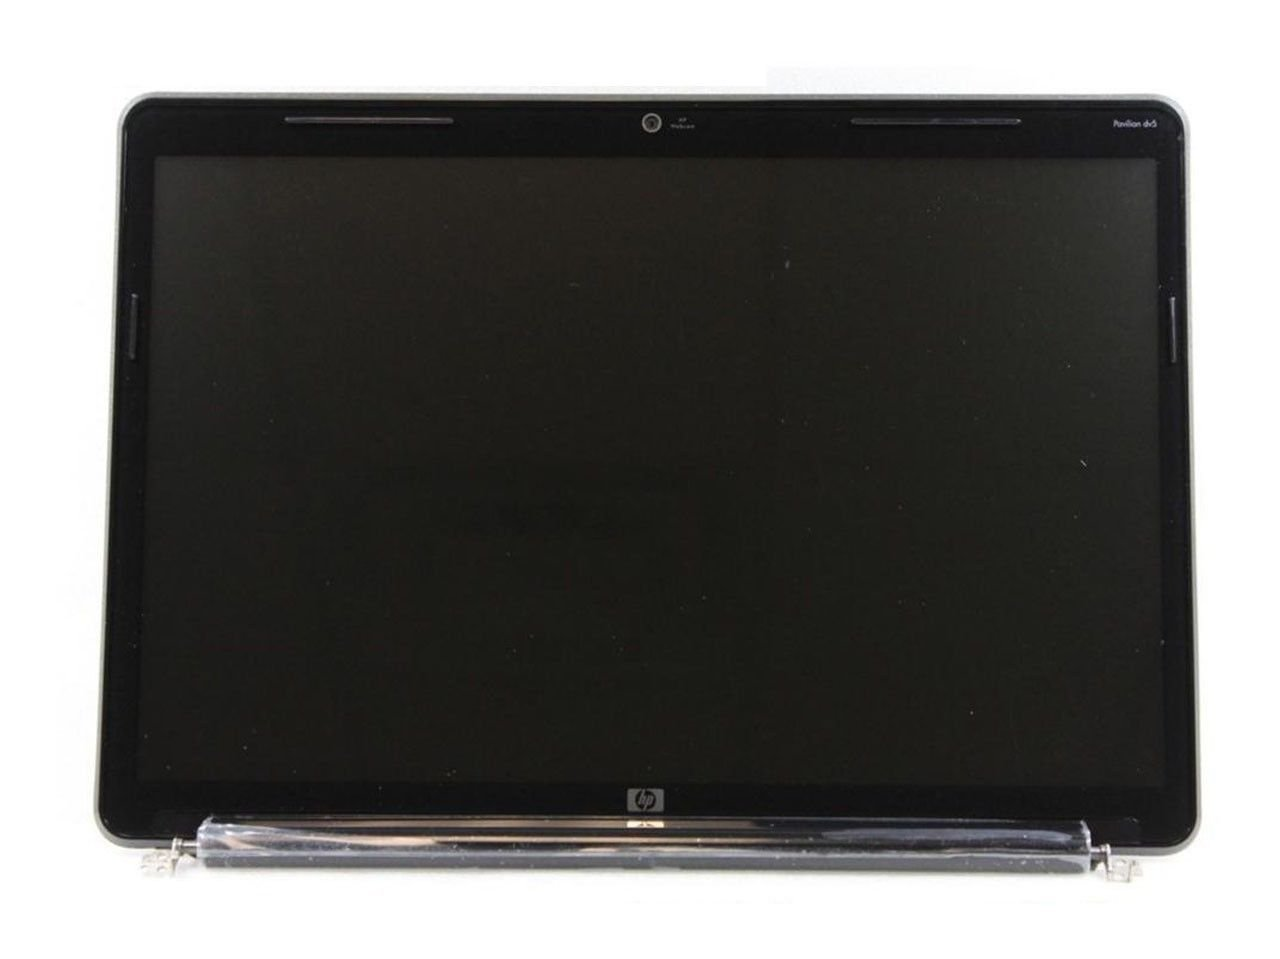 New Original HP Pavilion DV5 15.4inch TFT WSXGA Laptop LCD Screen - 484372-001